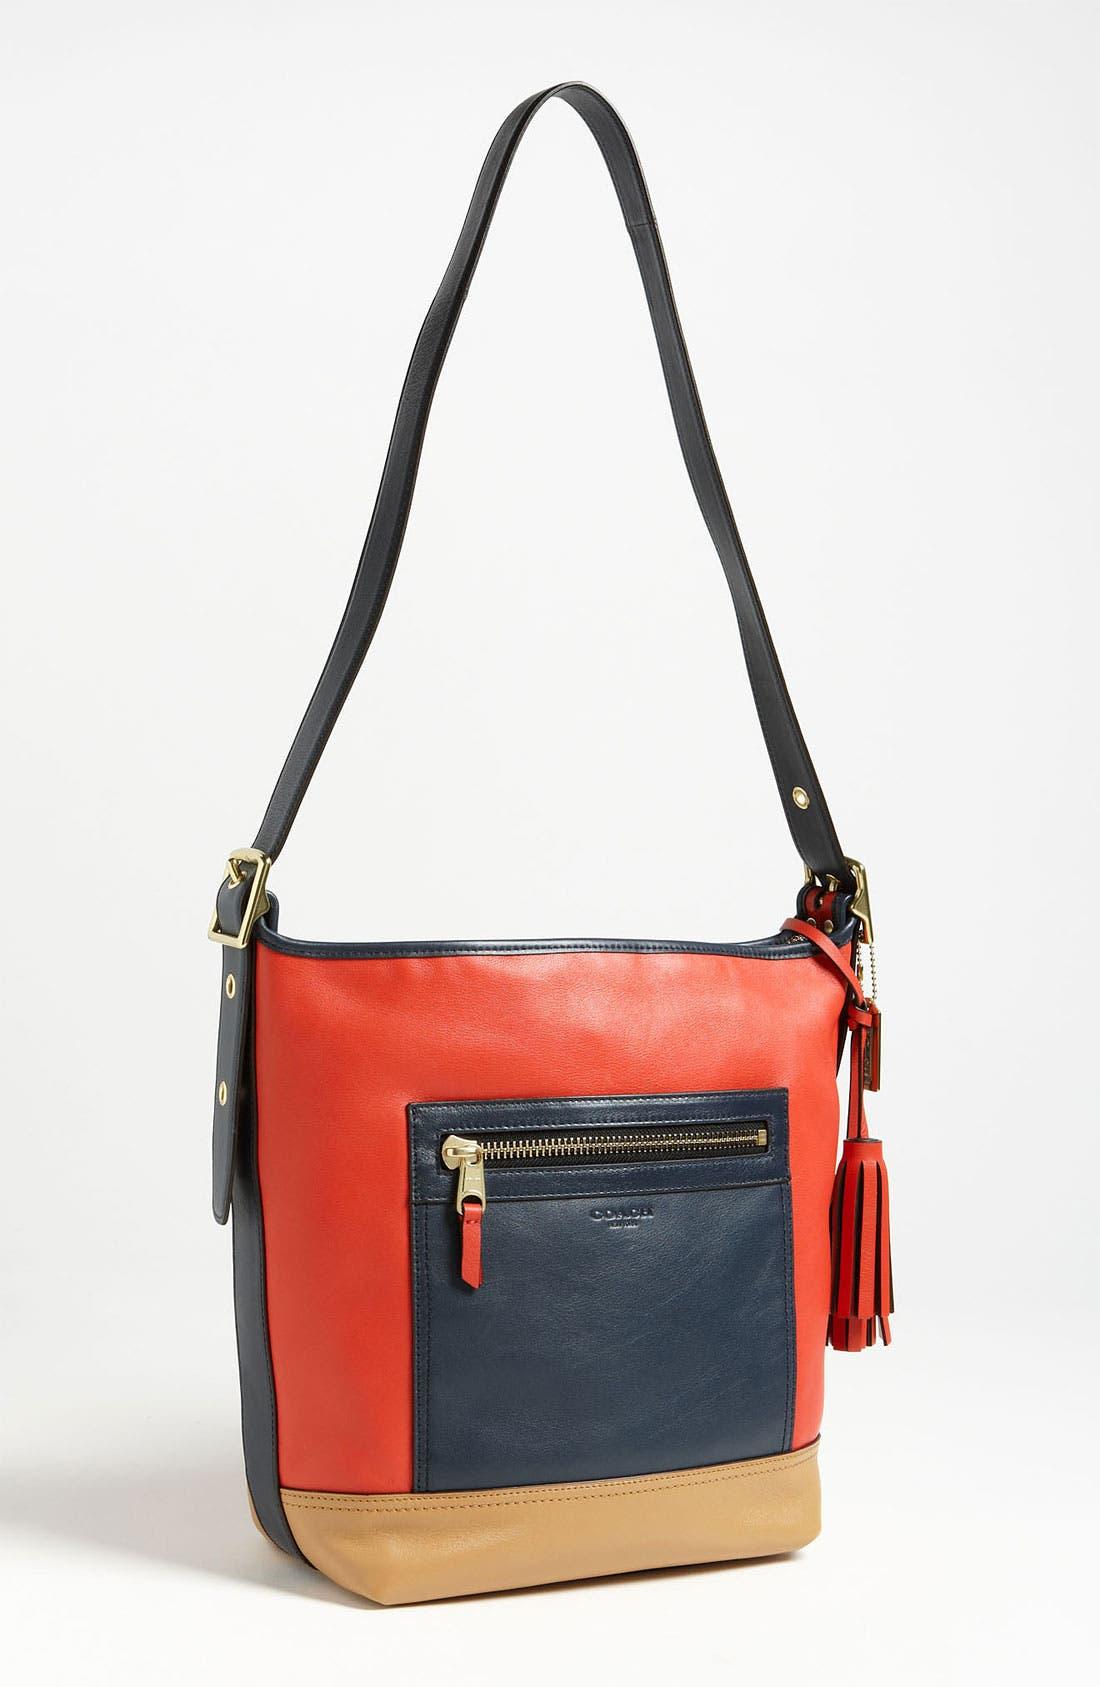 Alternate Image 1 Selected - COACH Colorblock Leather Duffel